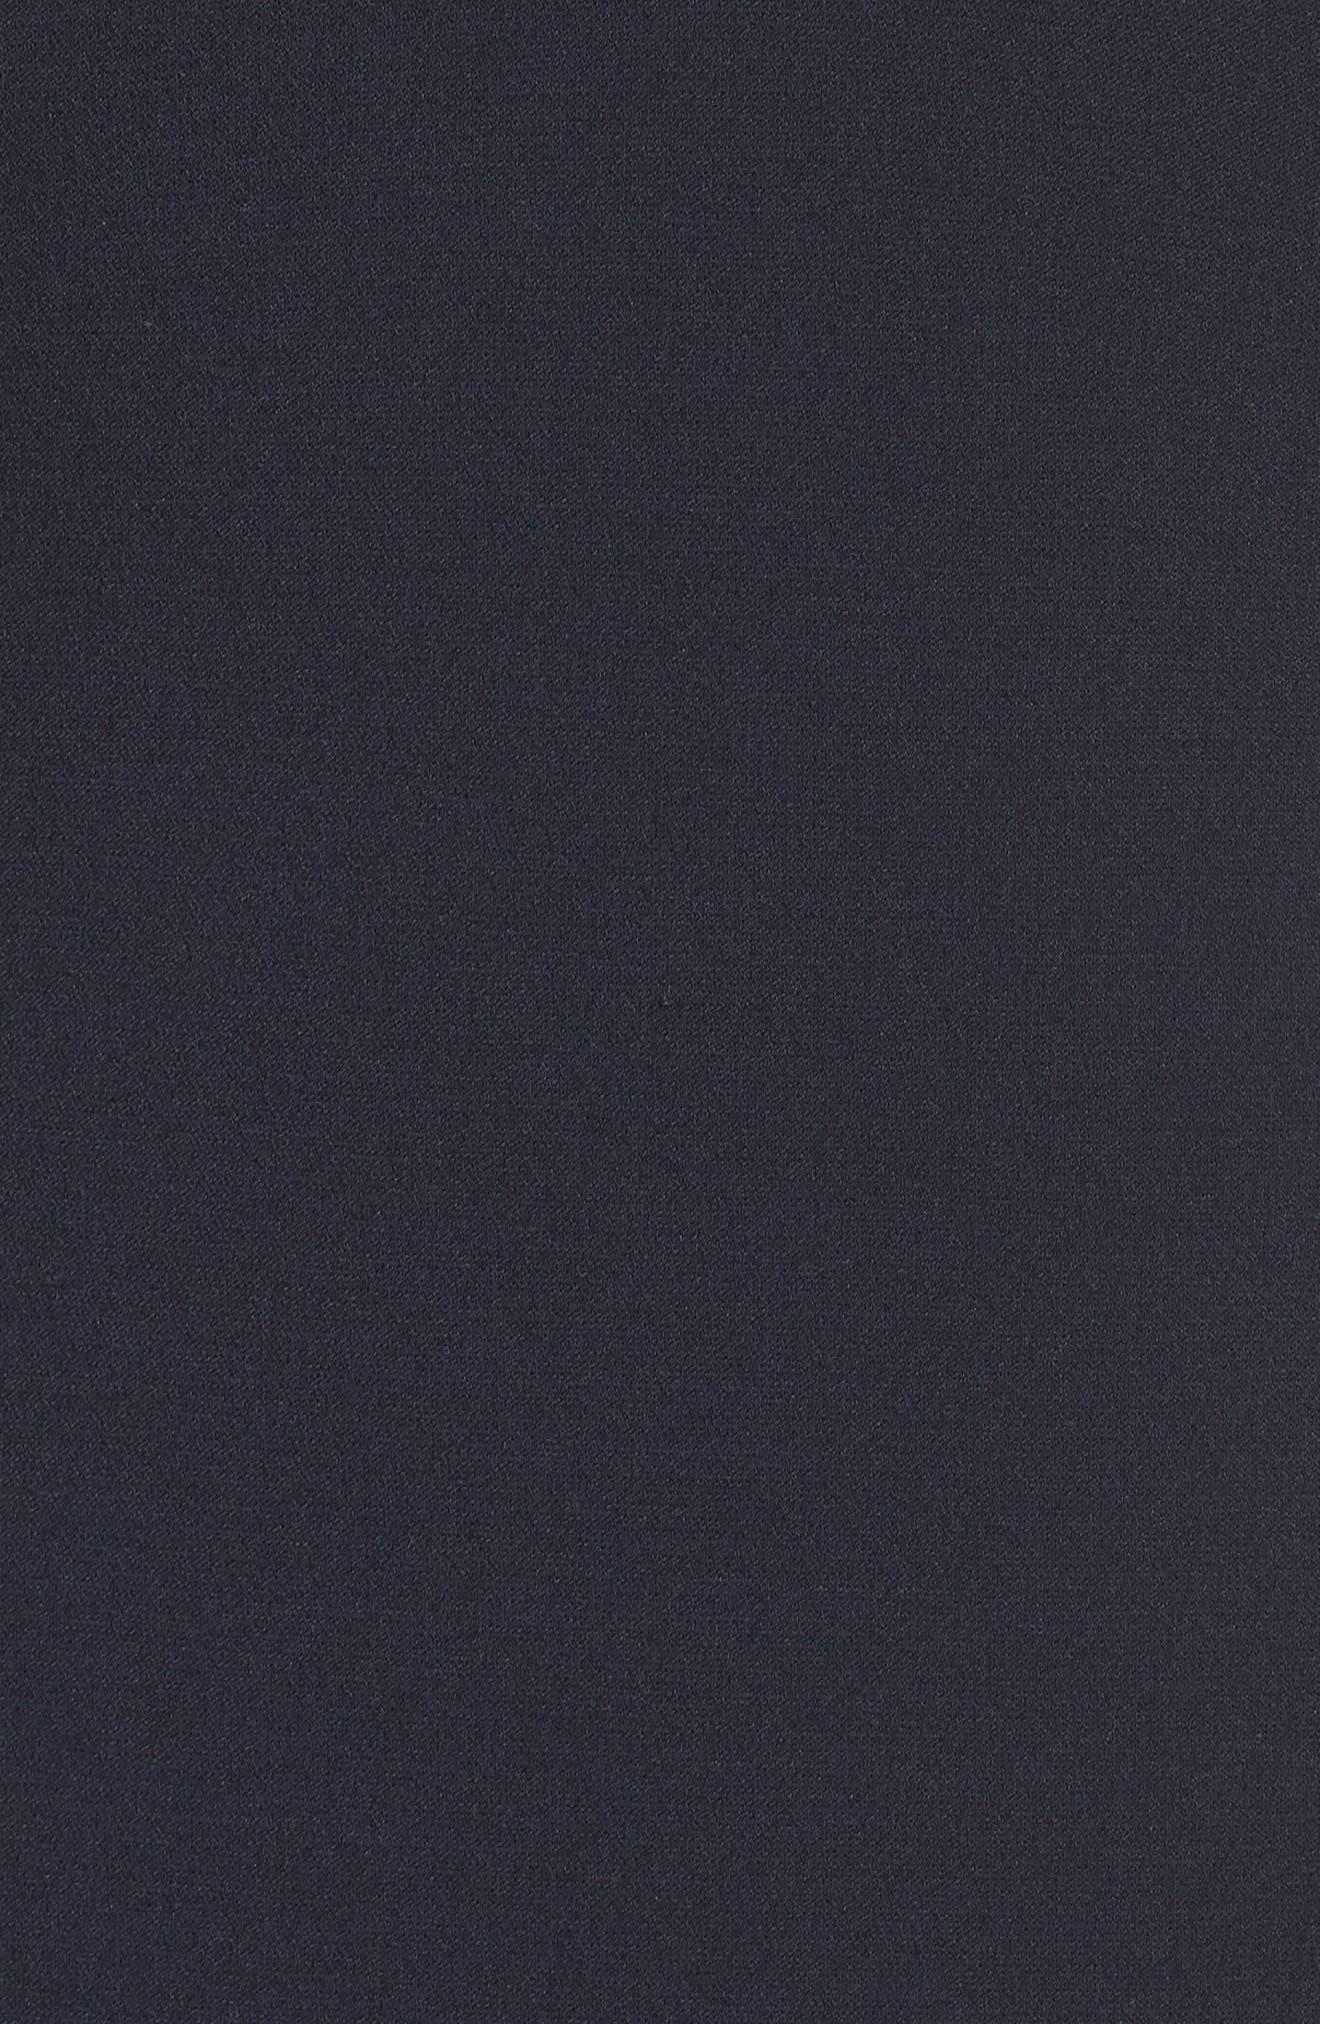 Illusion Flare Hem Midi Dress,                             Alternate thumbnail 5, color,                             DARK NAVY